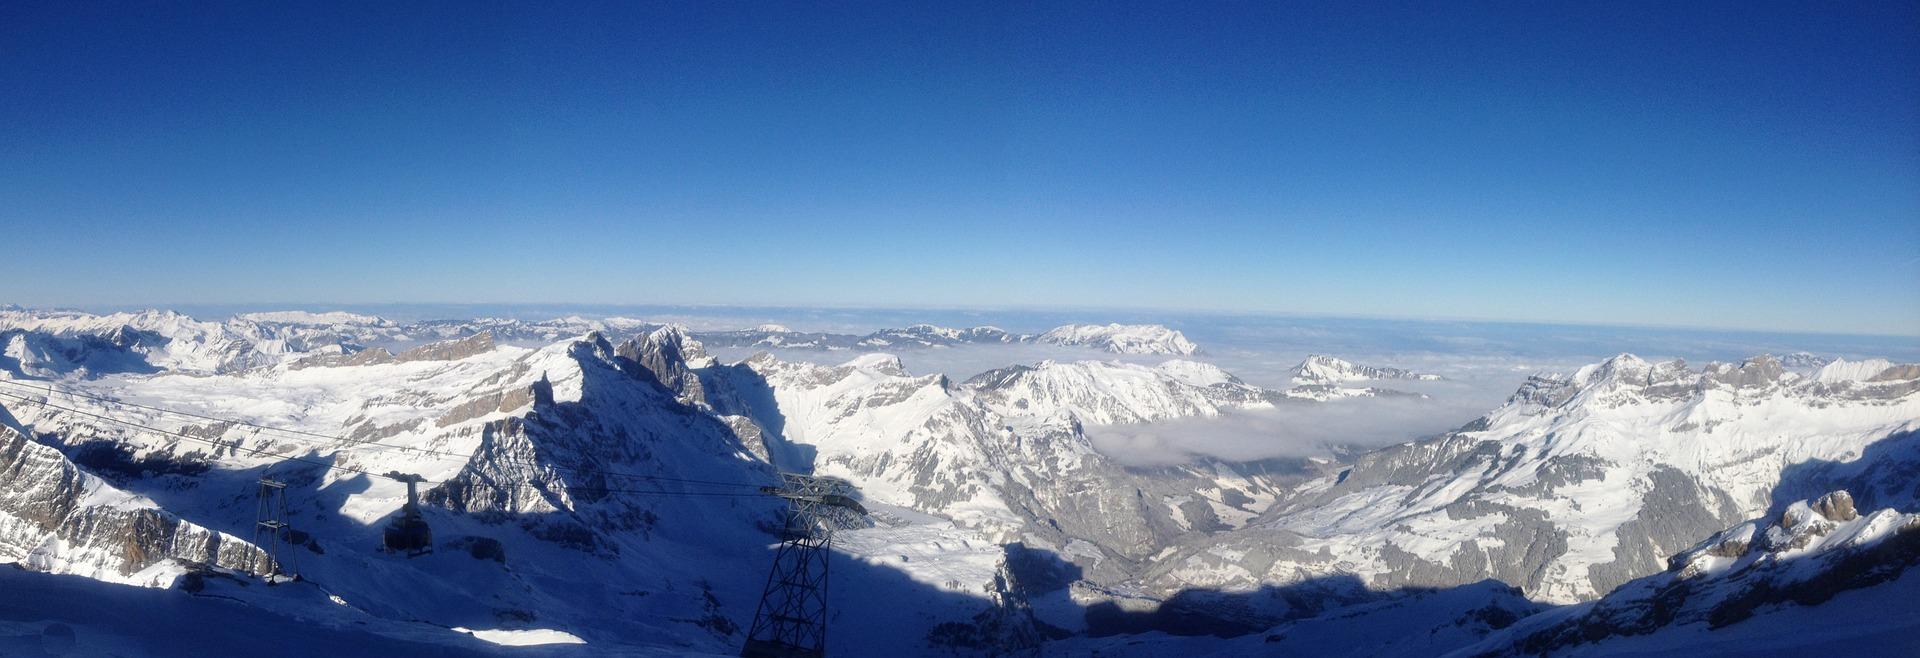 mountain-panorama-1462911_1920